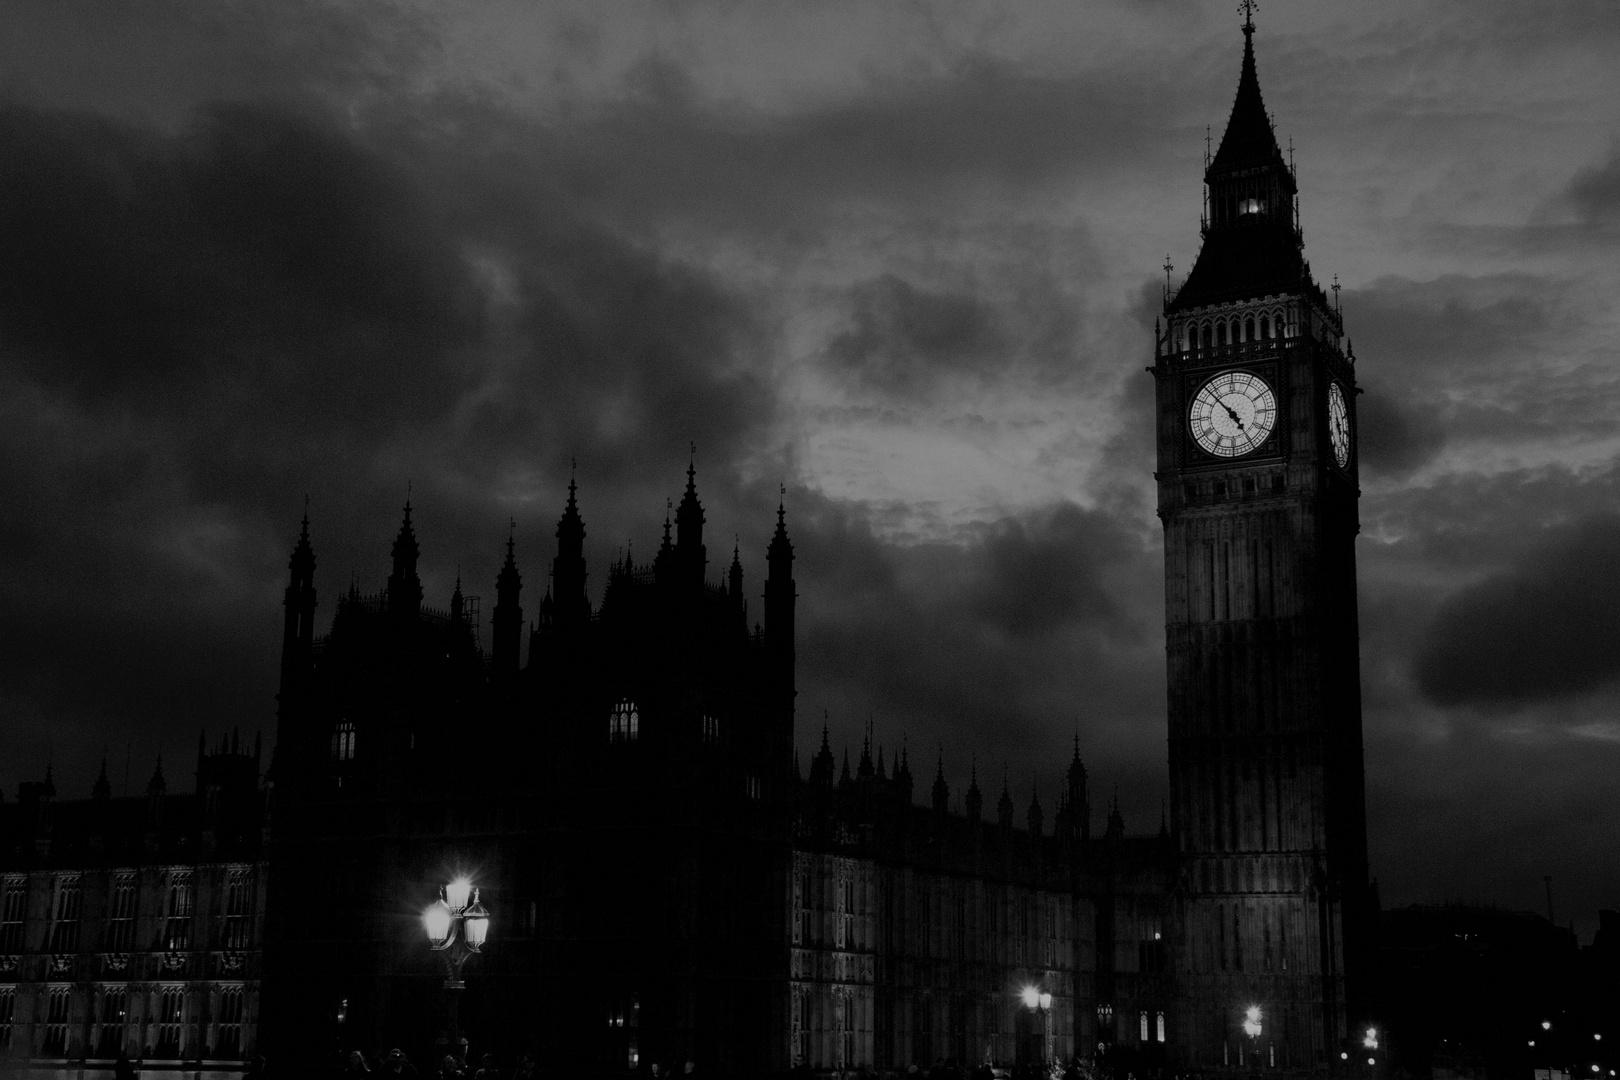 London mit Big Ben